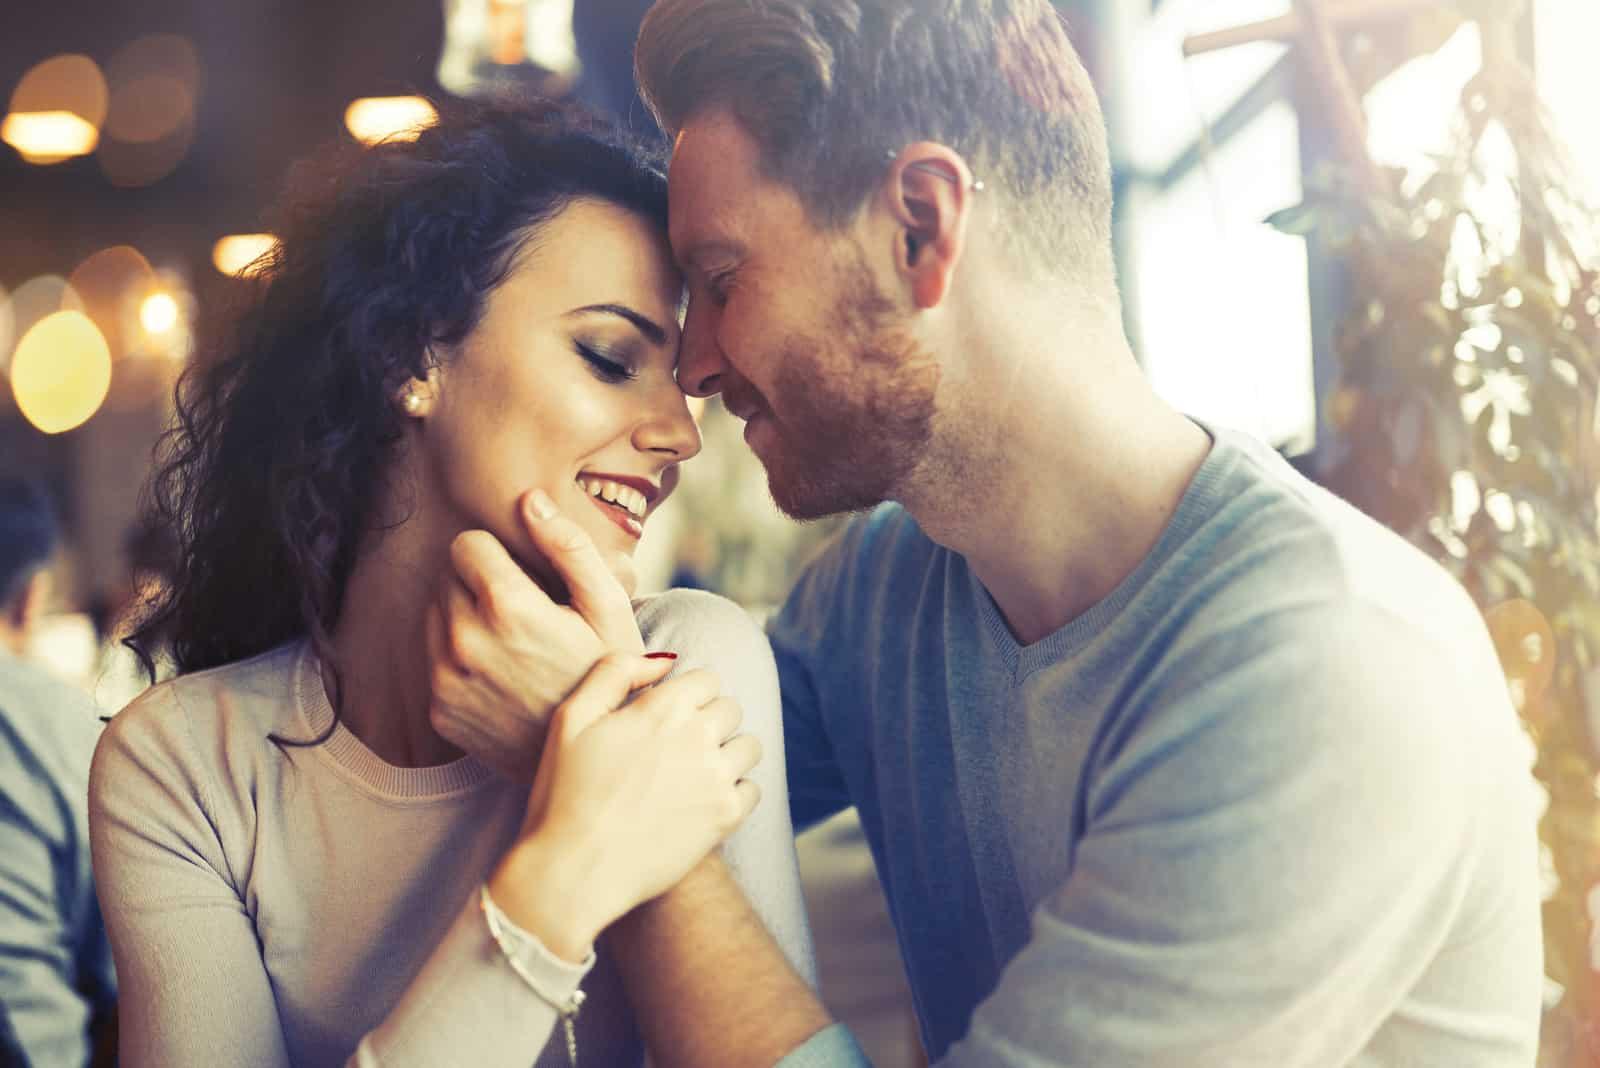 a beautiful man and woman sit embracing